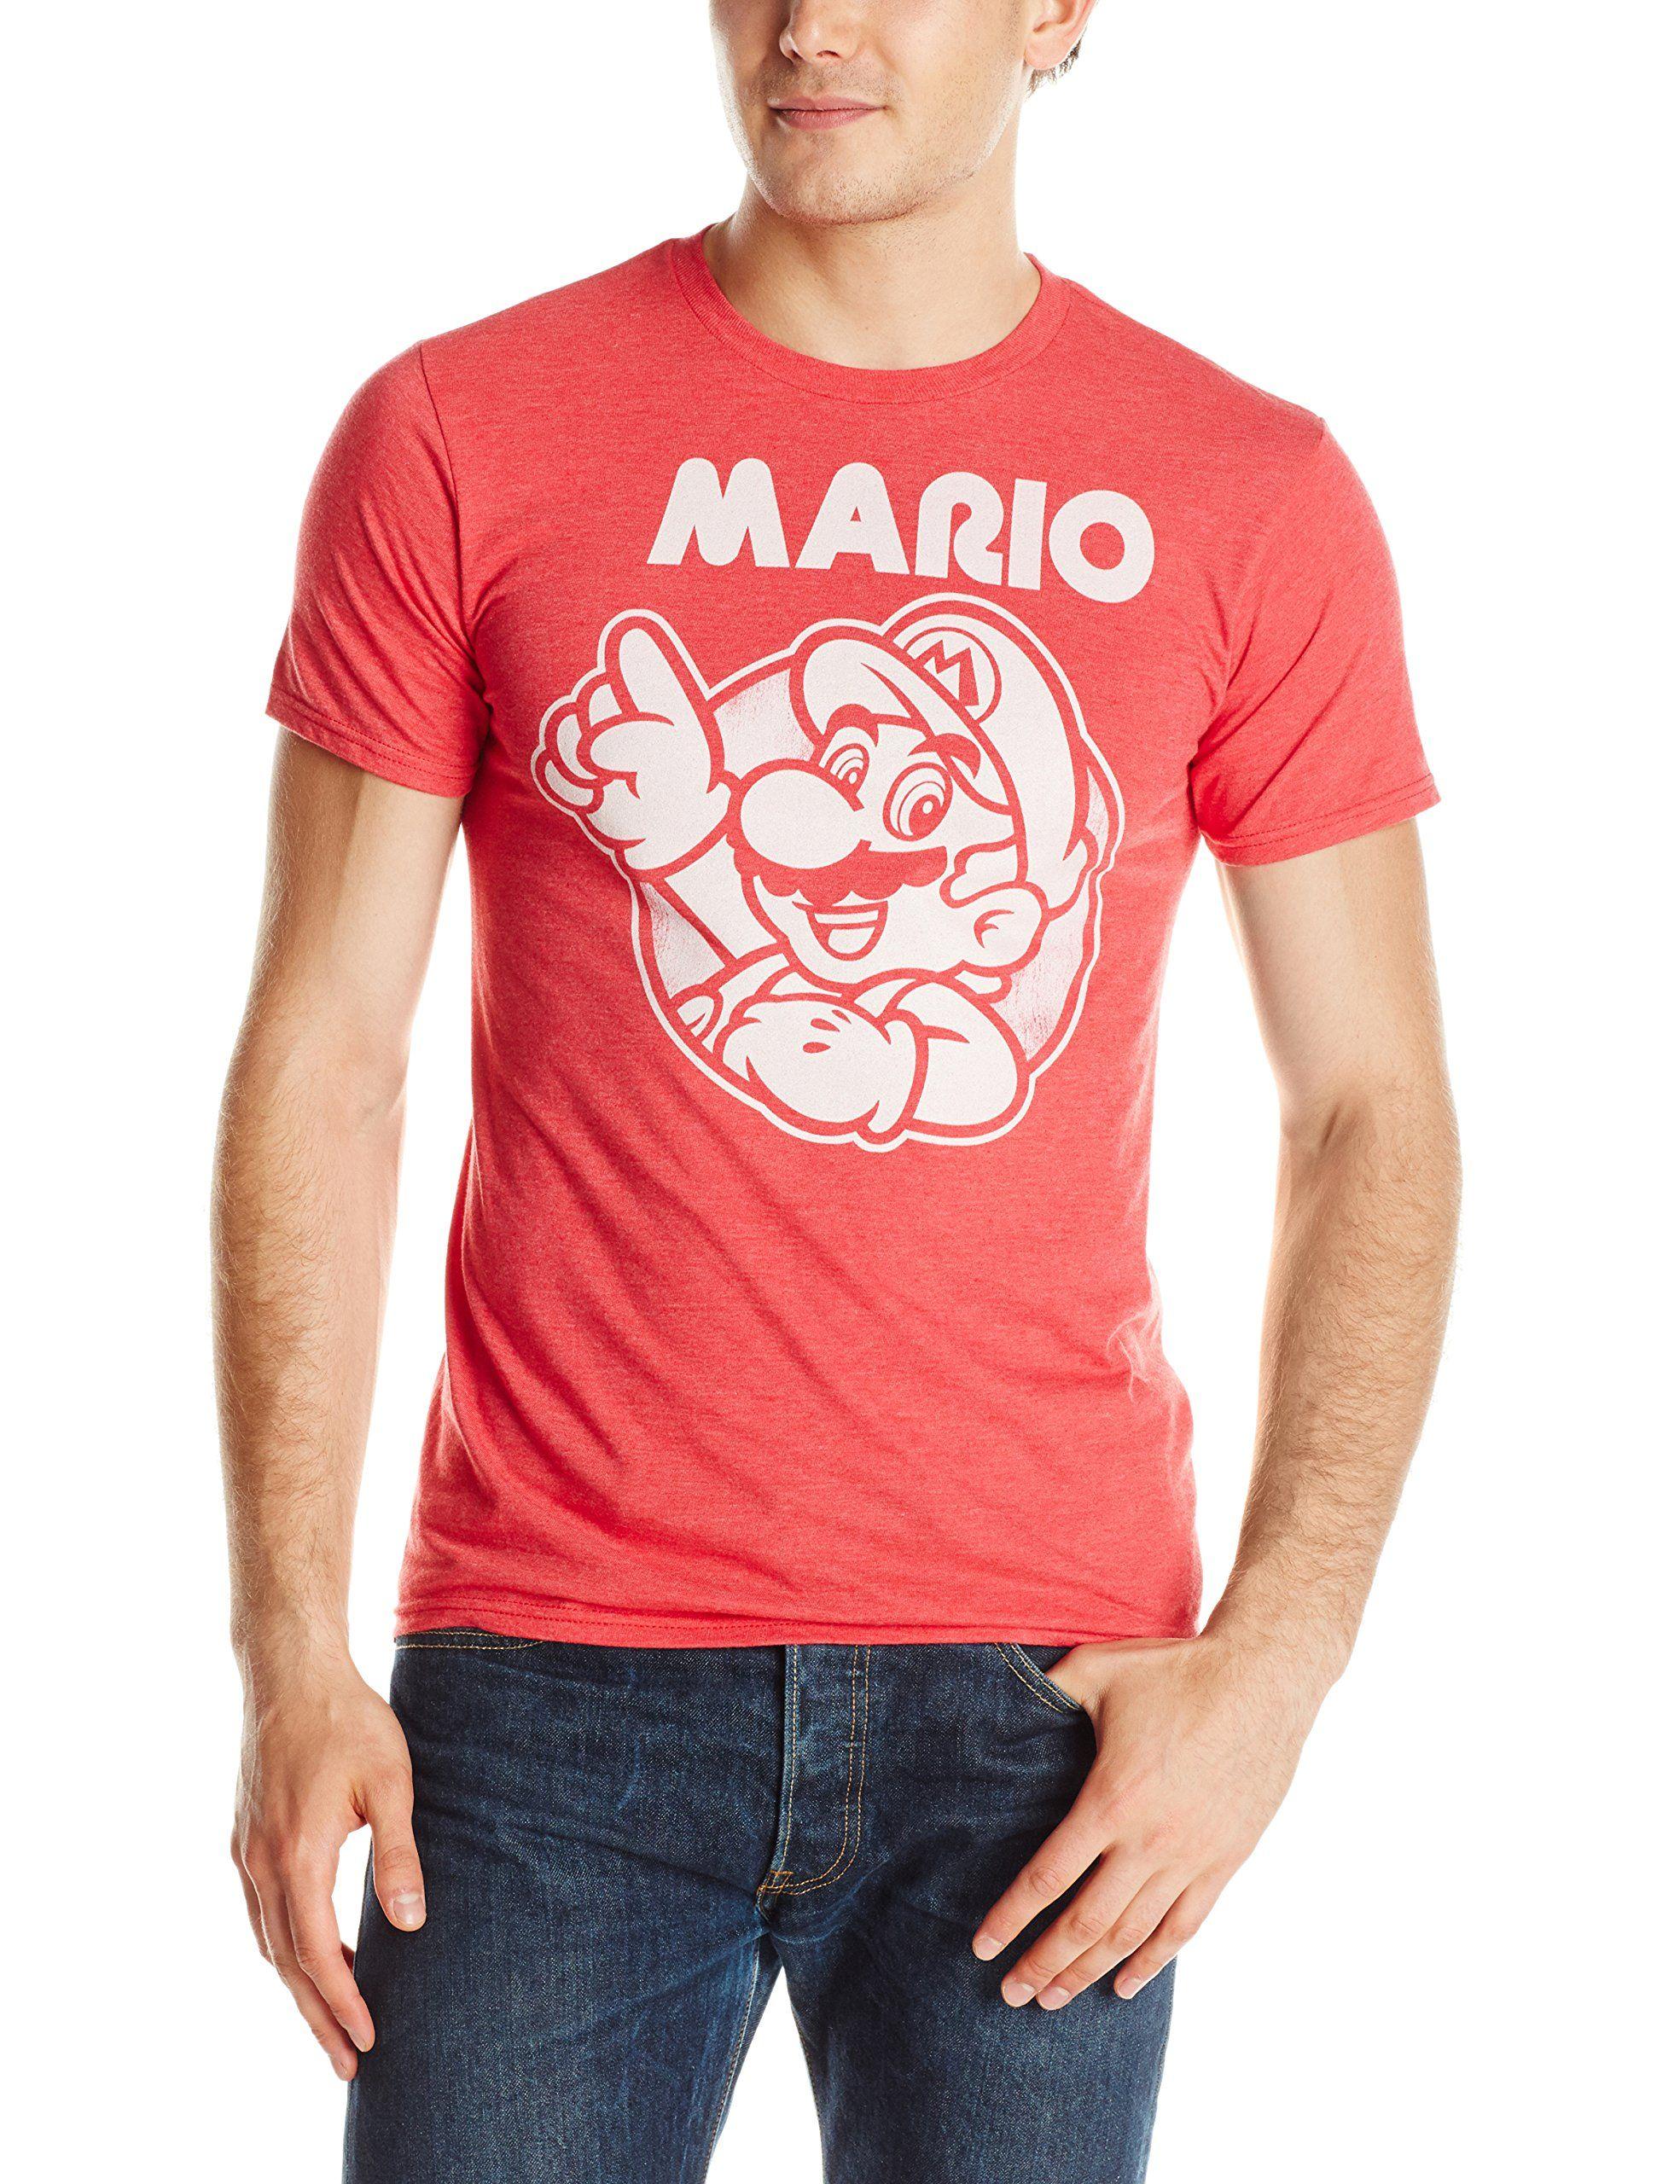 Nintendo Men's So Mario T-Shirt, Red Heather, Medium